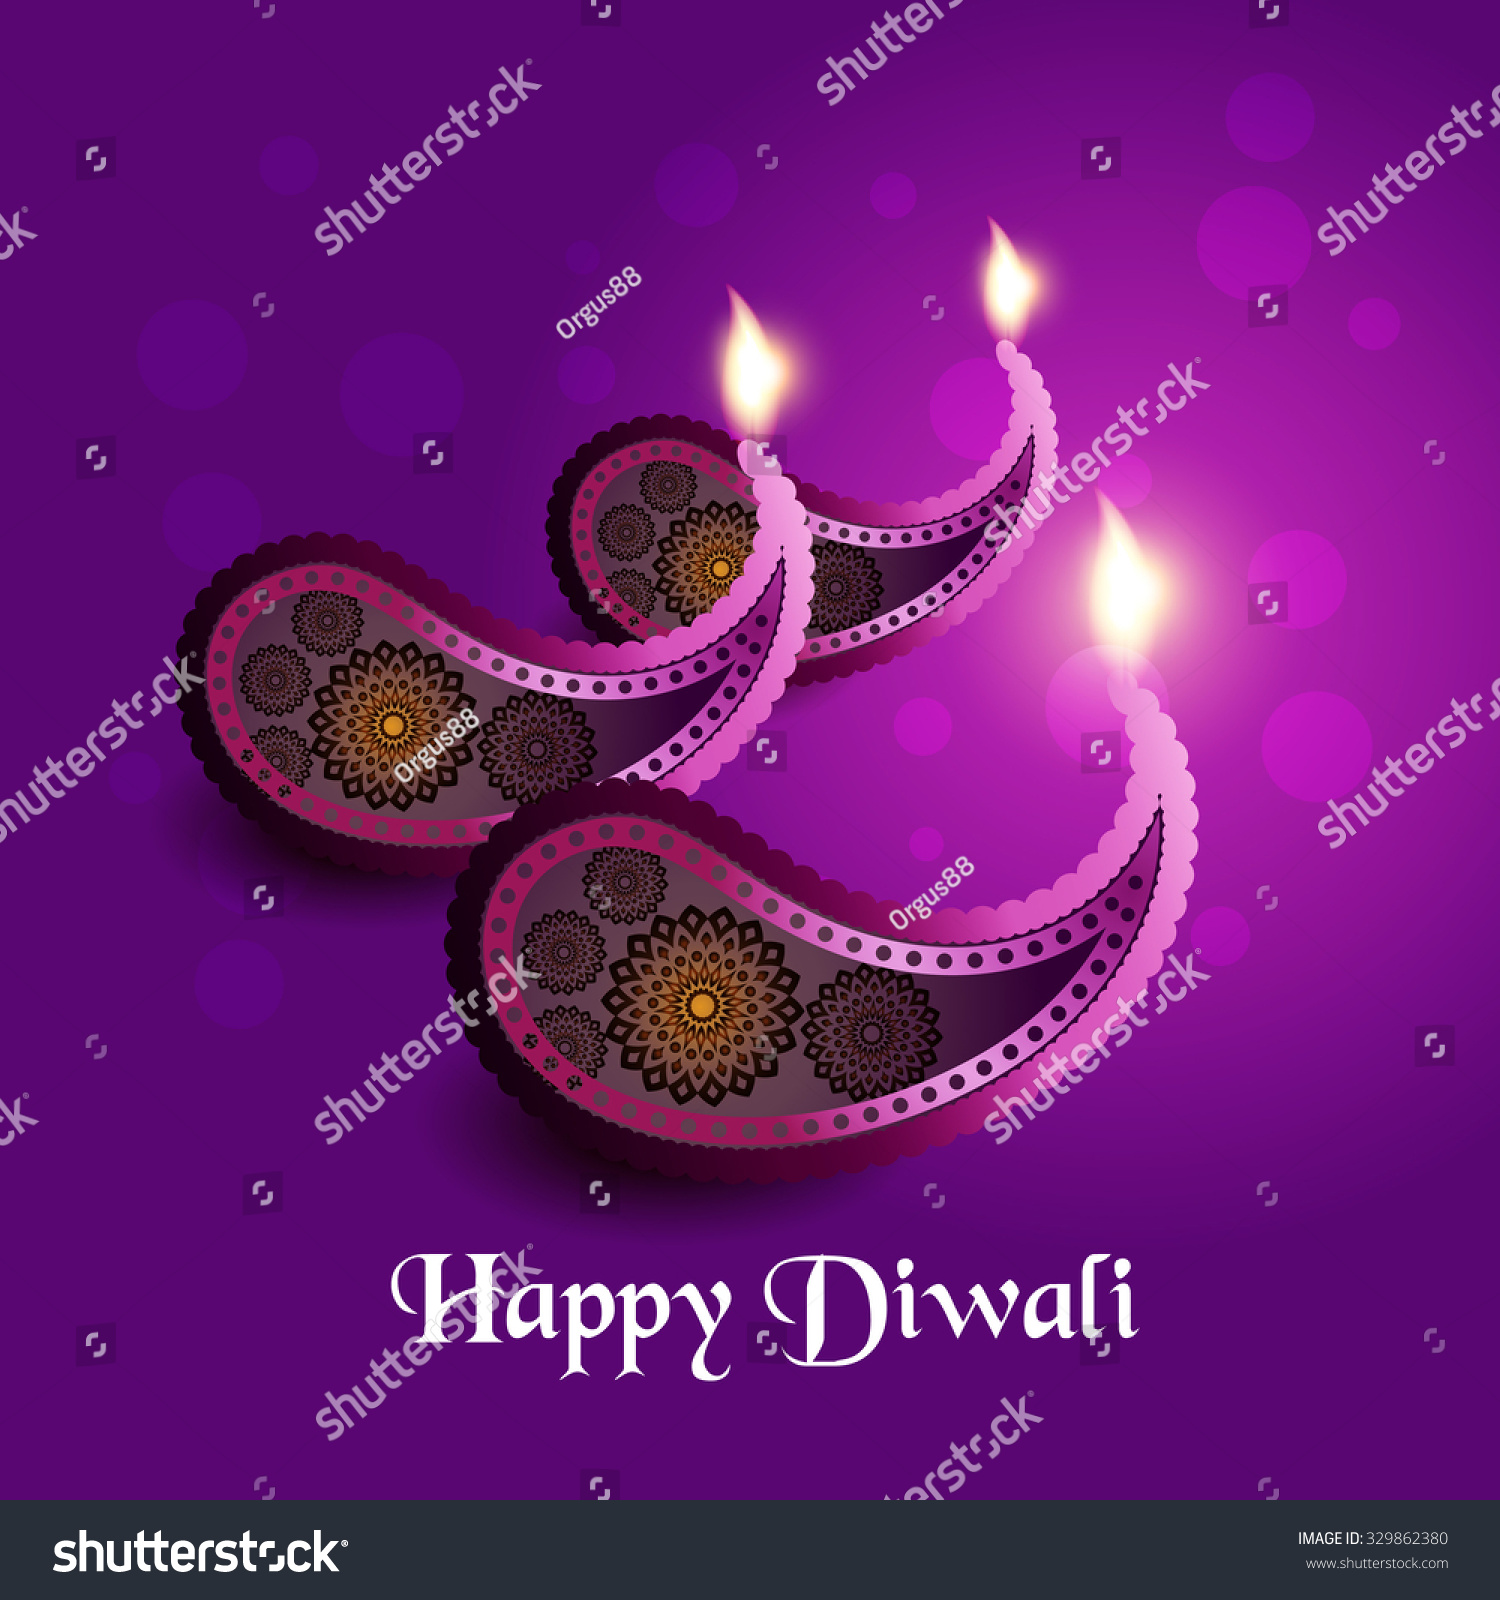 Royalty Free Beautiful Greeting Card For Hindu 329862380 Stock